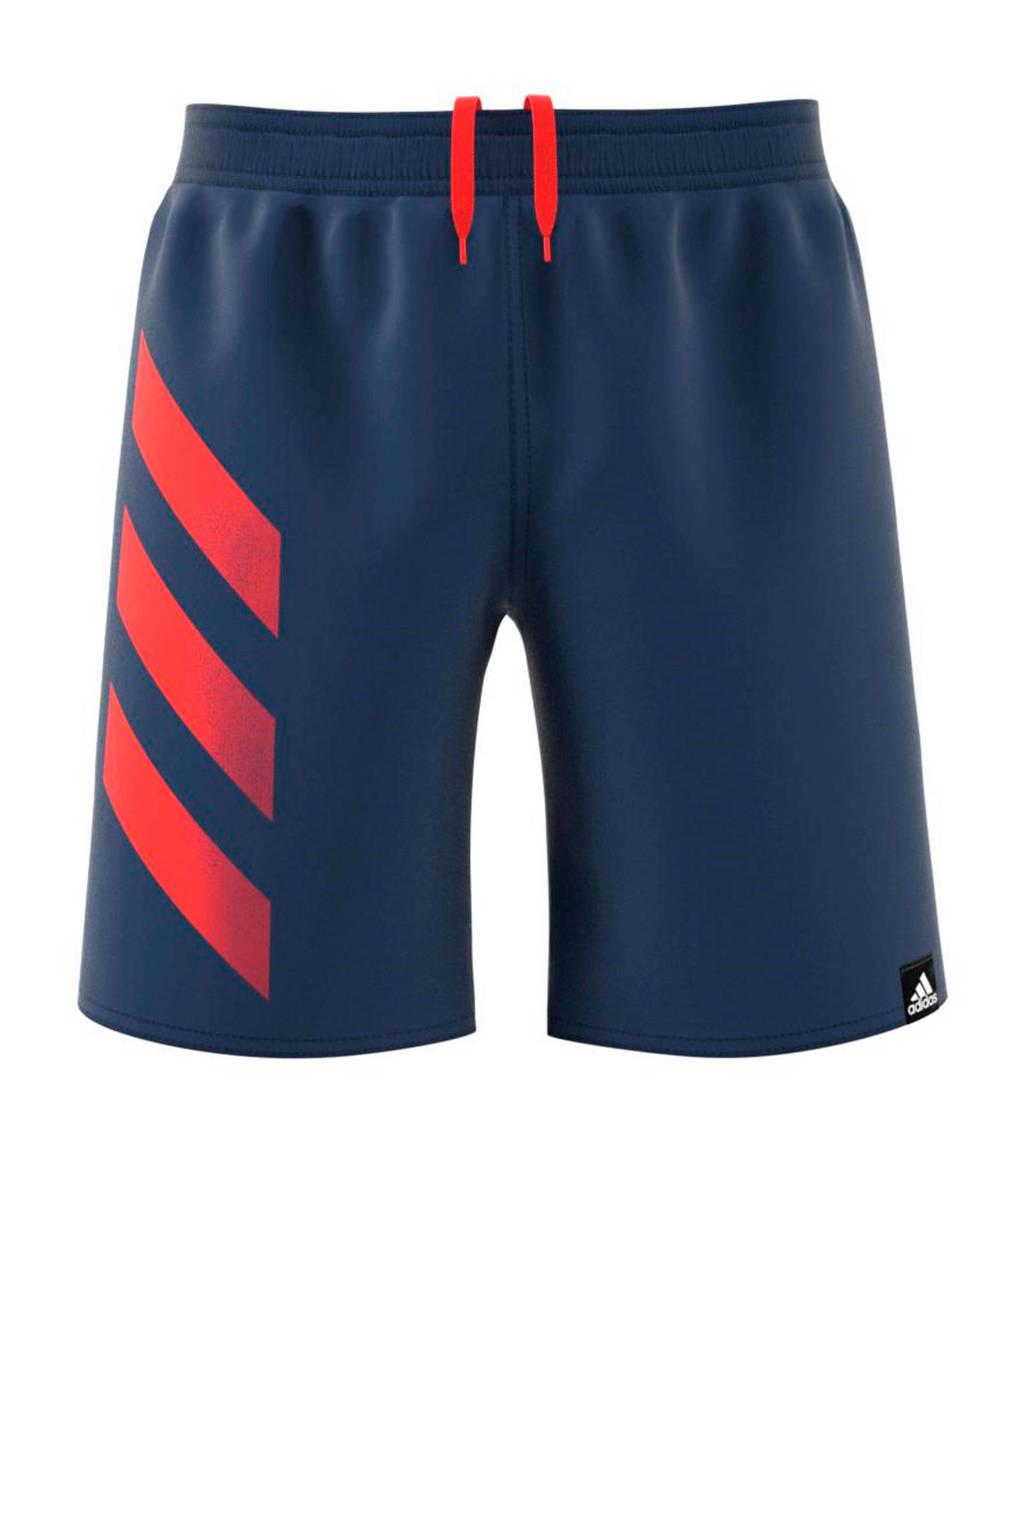 adidas Performance zwemshort blauw, Blauw / Rood